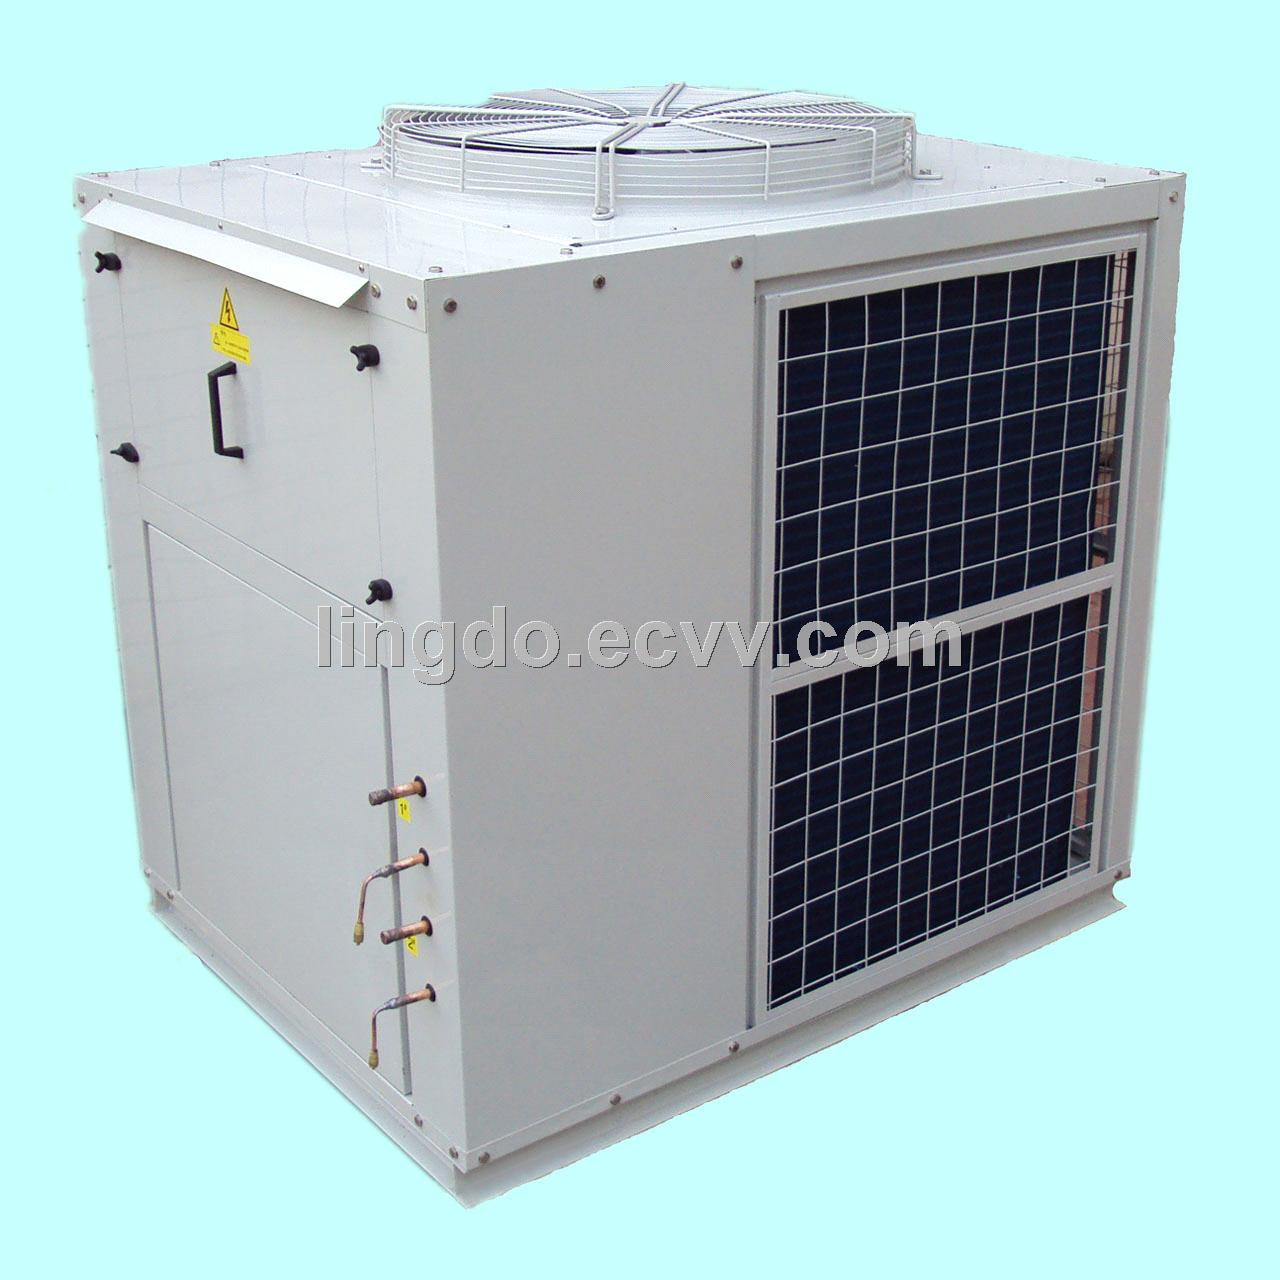 Air Cooled Condensing Unit / ACCU (SW) China air cooled condenser  #30989B